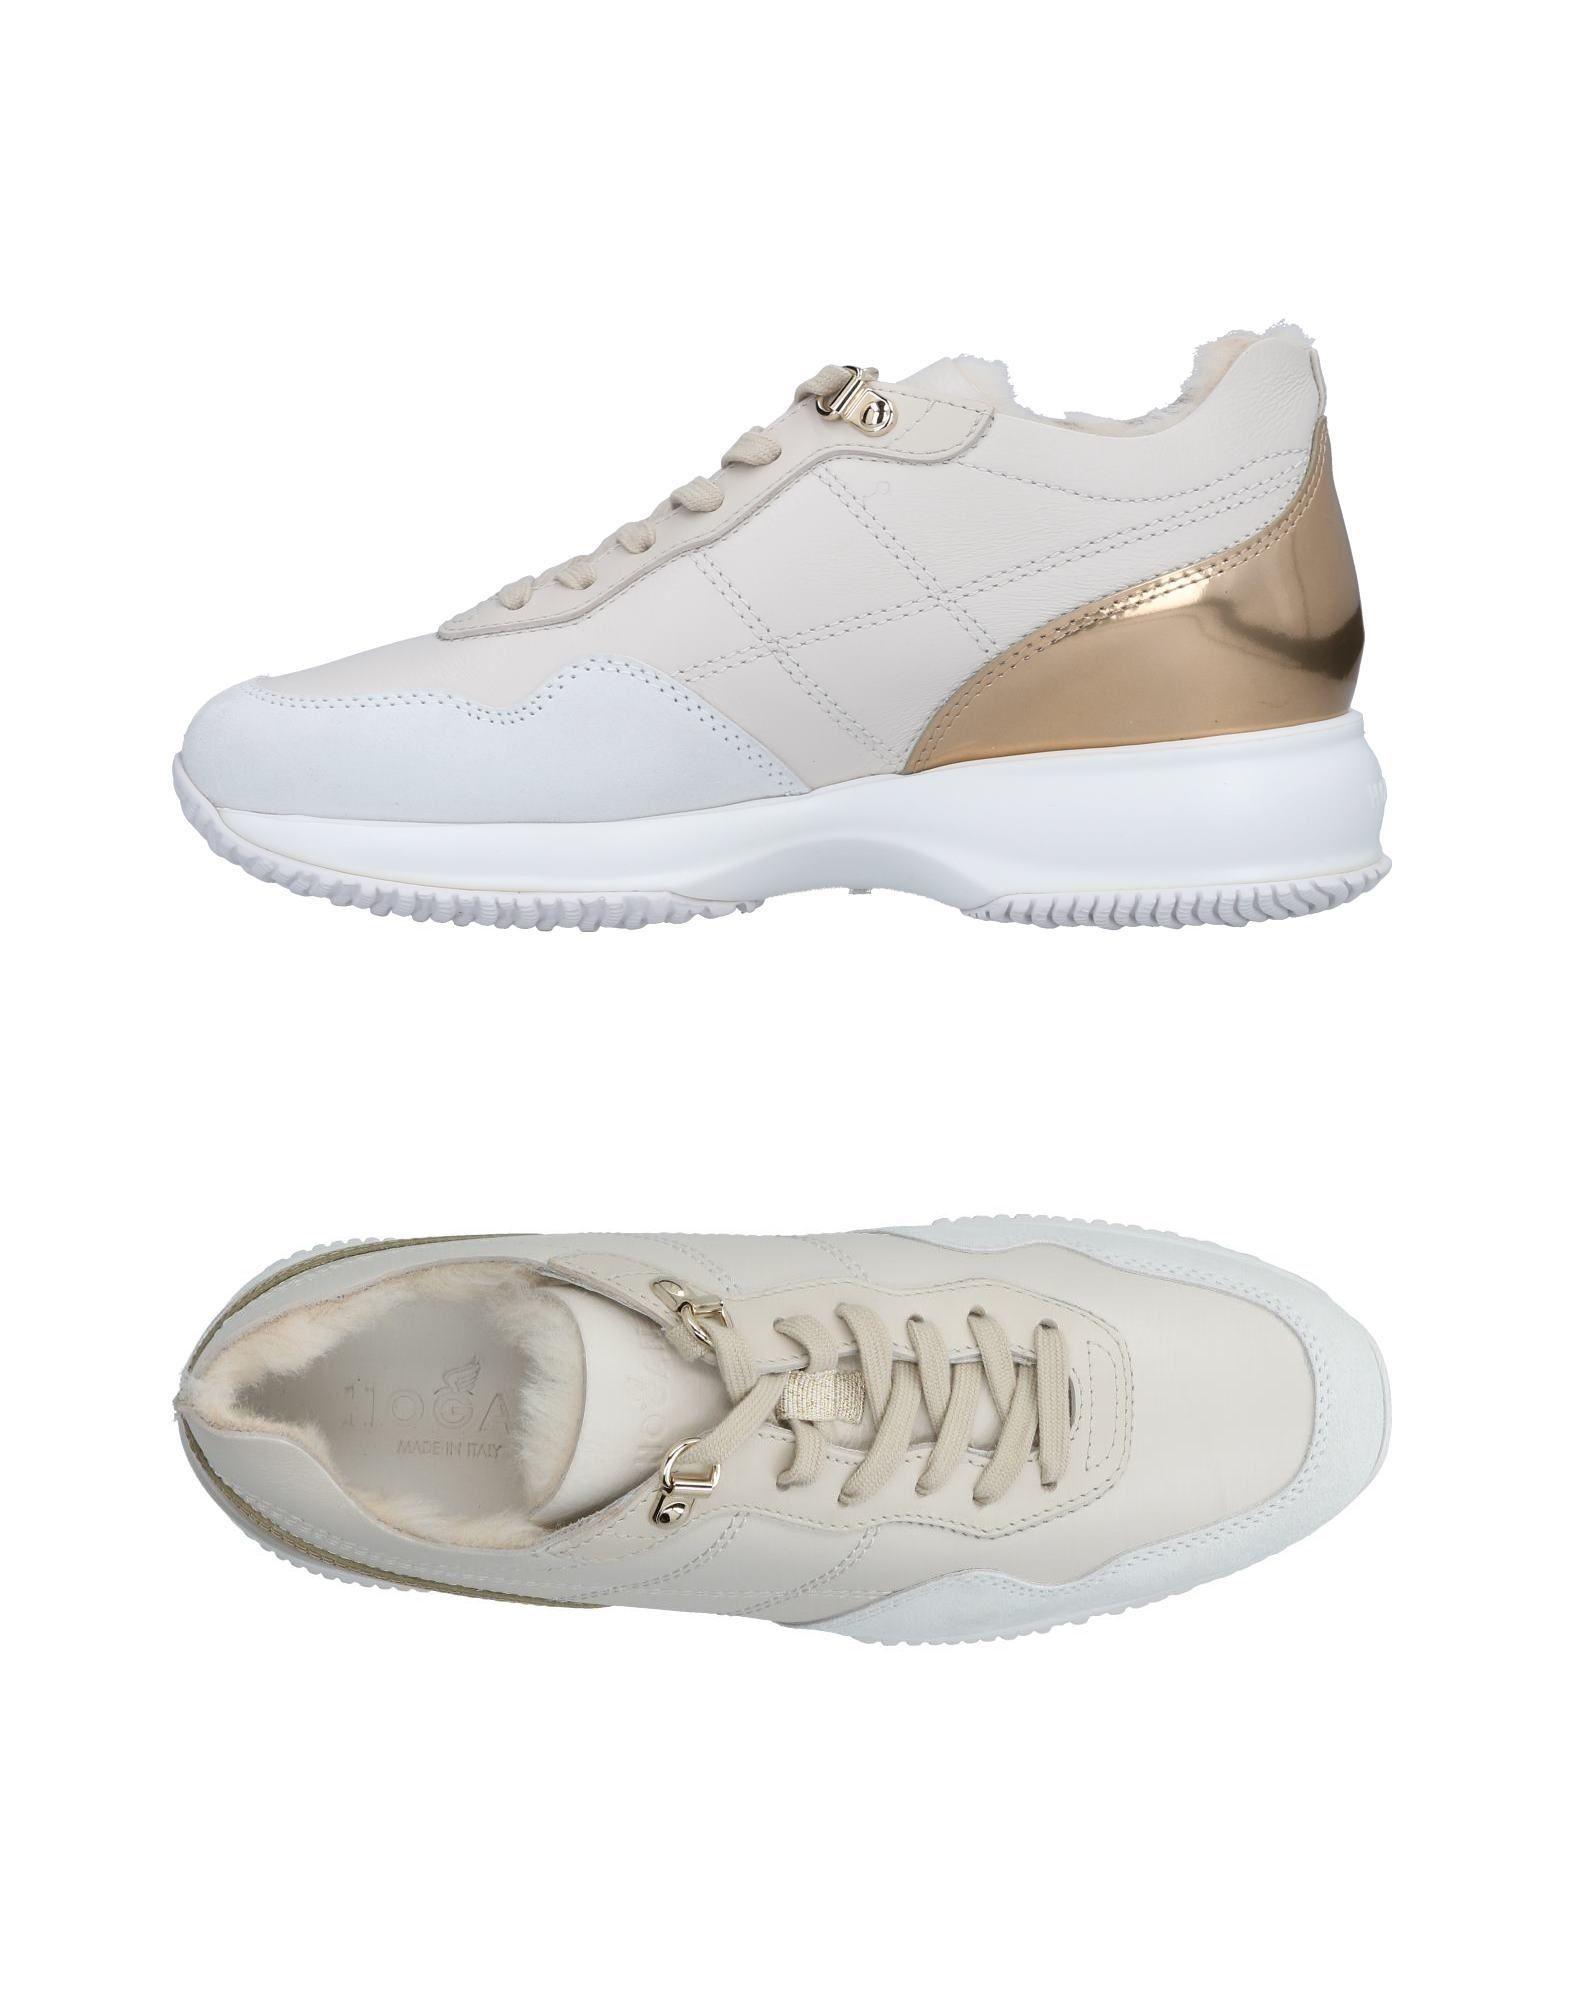 Hogan Sneakers Damen  11496082EJGut aussehende strapazierfähige Schuhe